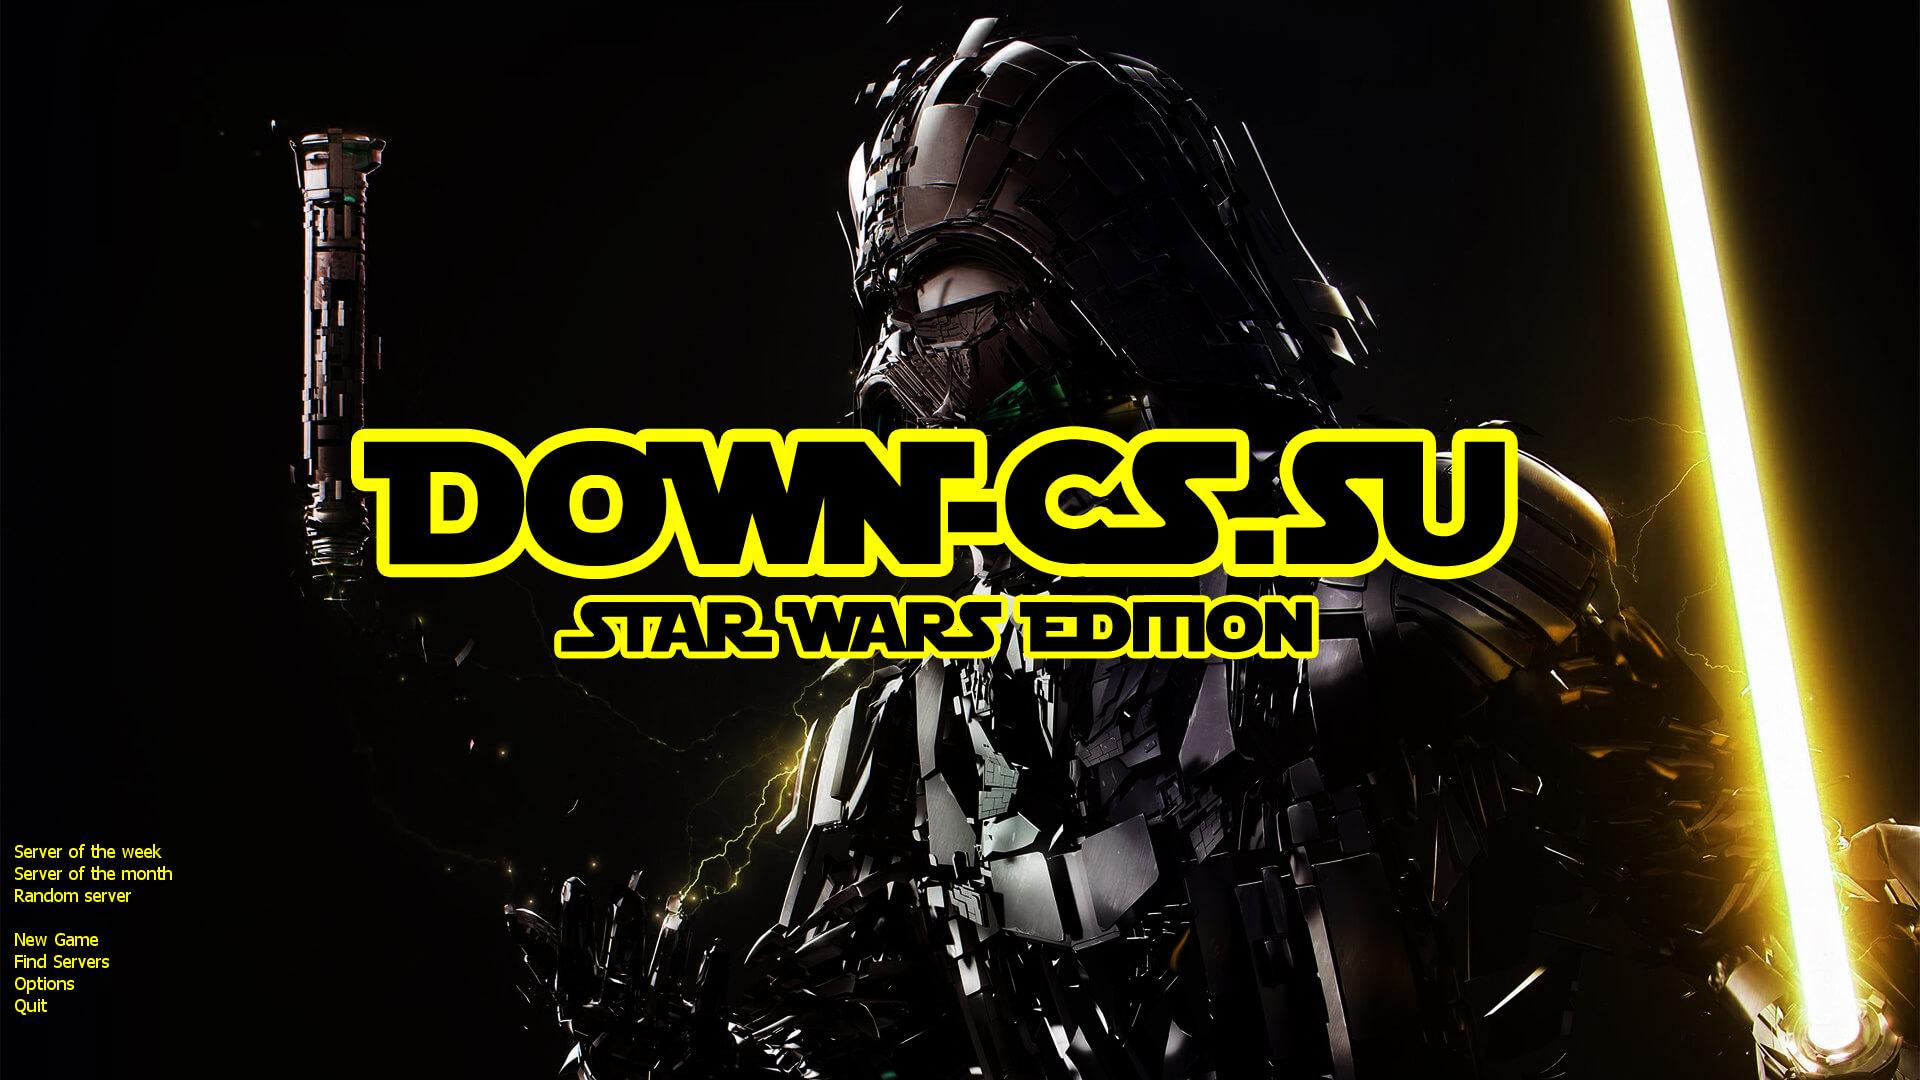 Download CS 1.6 Star Wars Edition